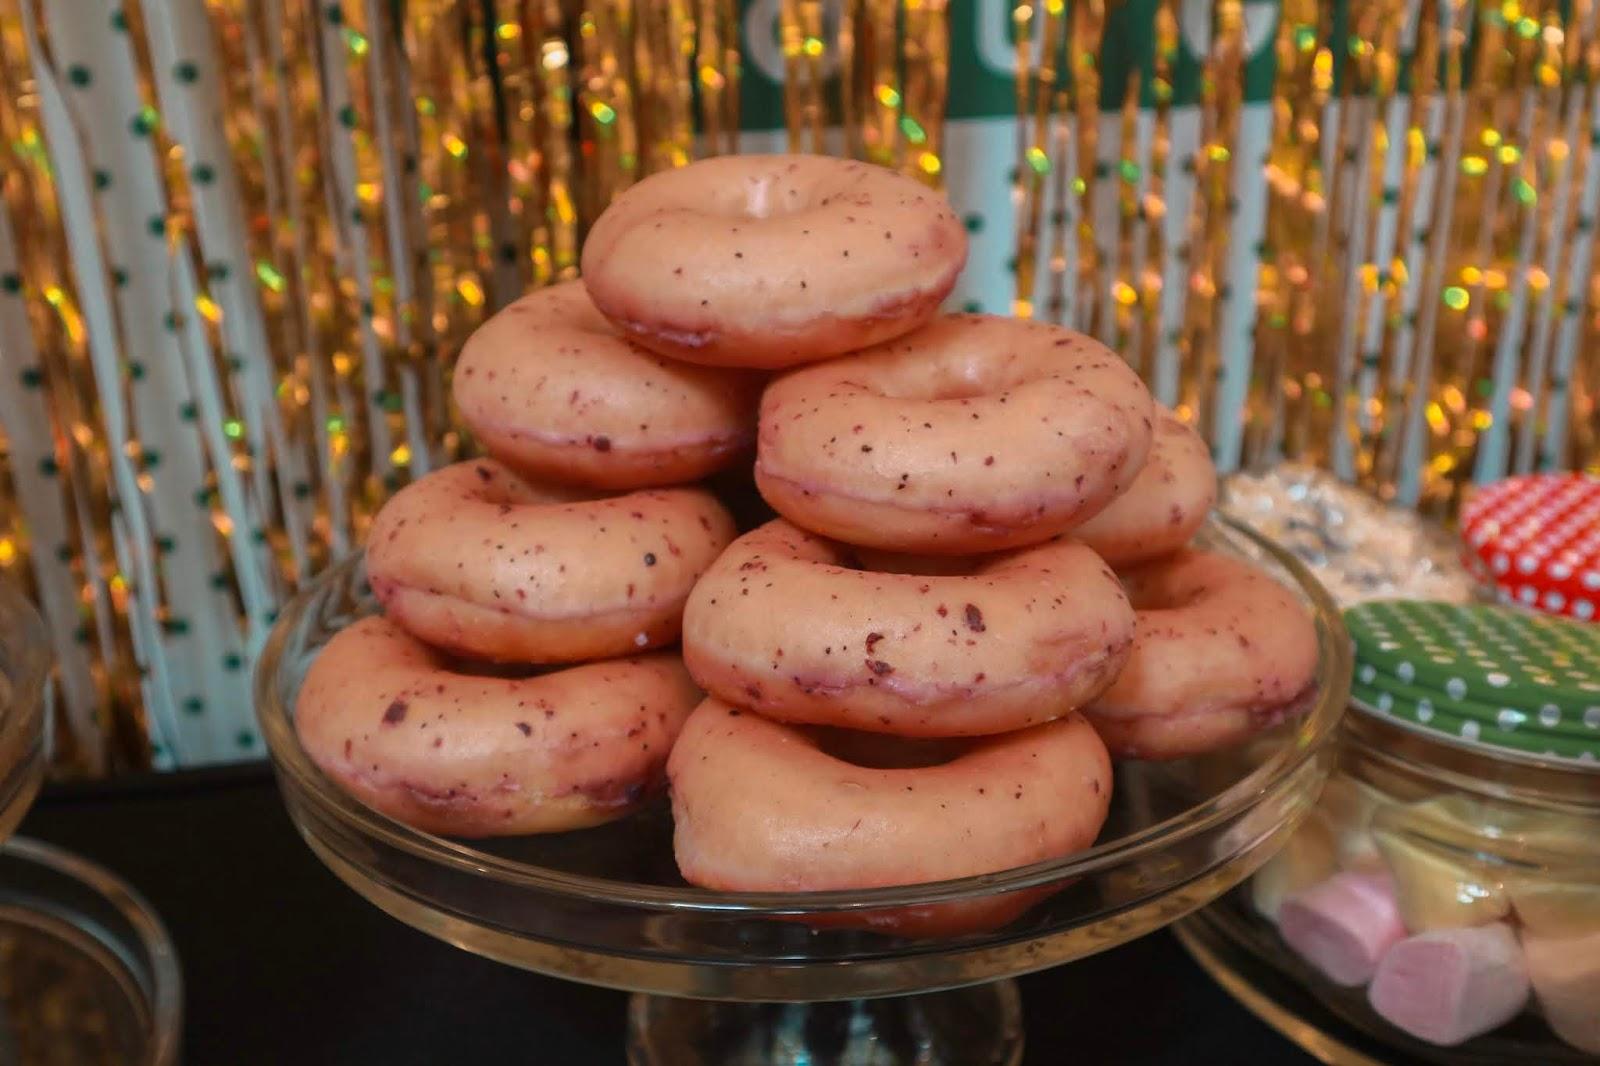 Krispy Kreme Blueberry Bliss Glaze Doughnuts